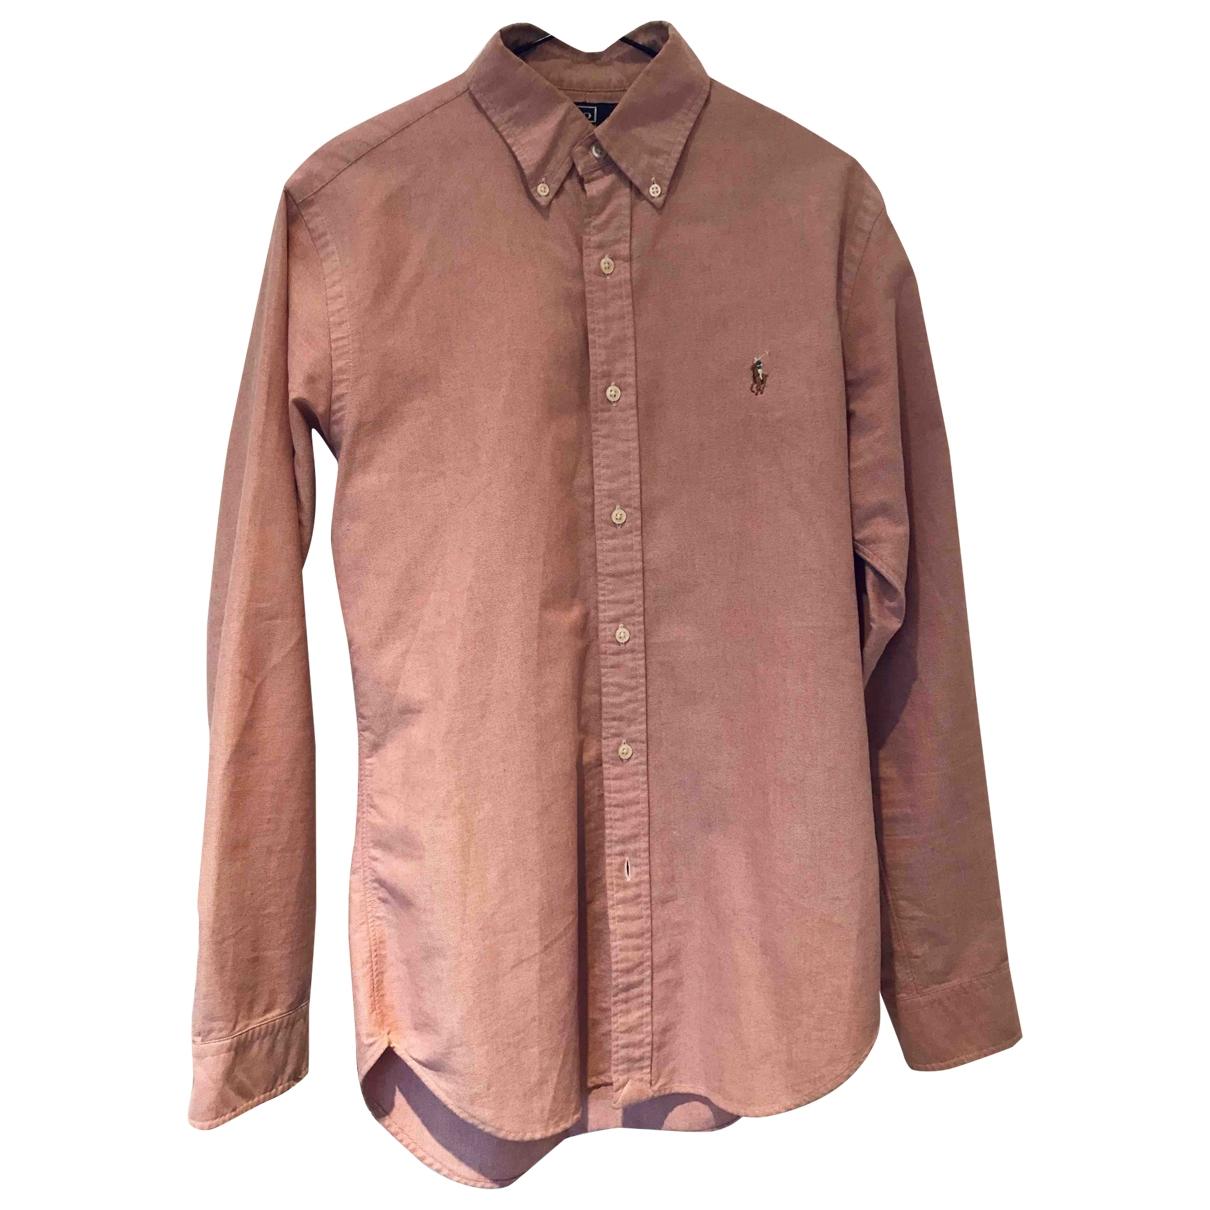 Polo Ralph Lauren \N Pink Cotton Shirts for Men S International